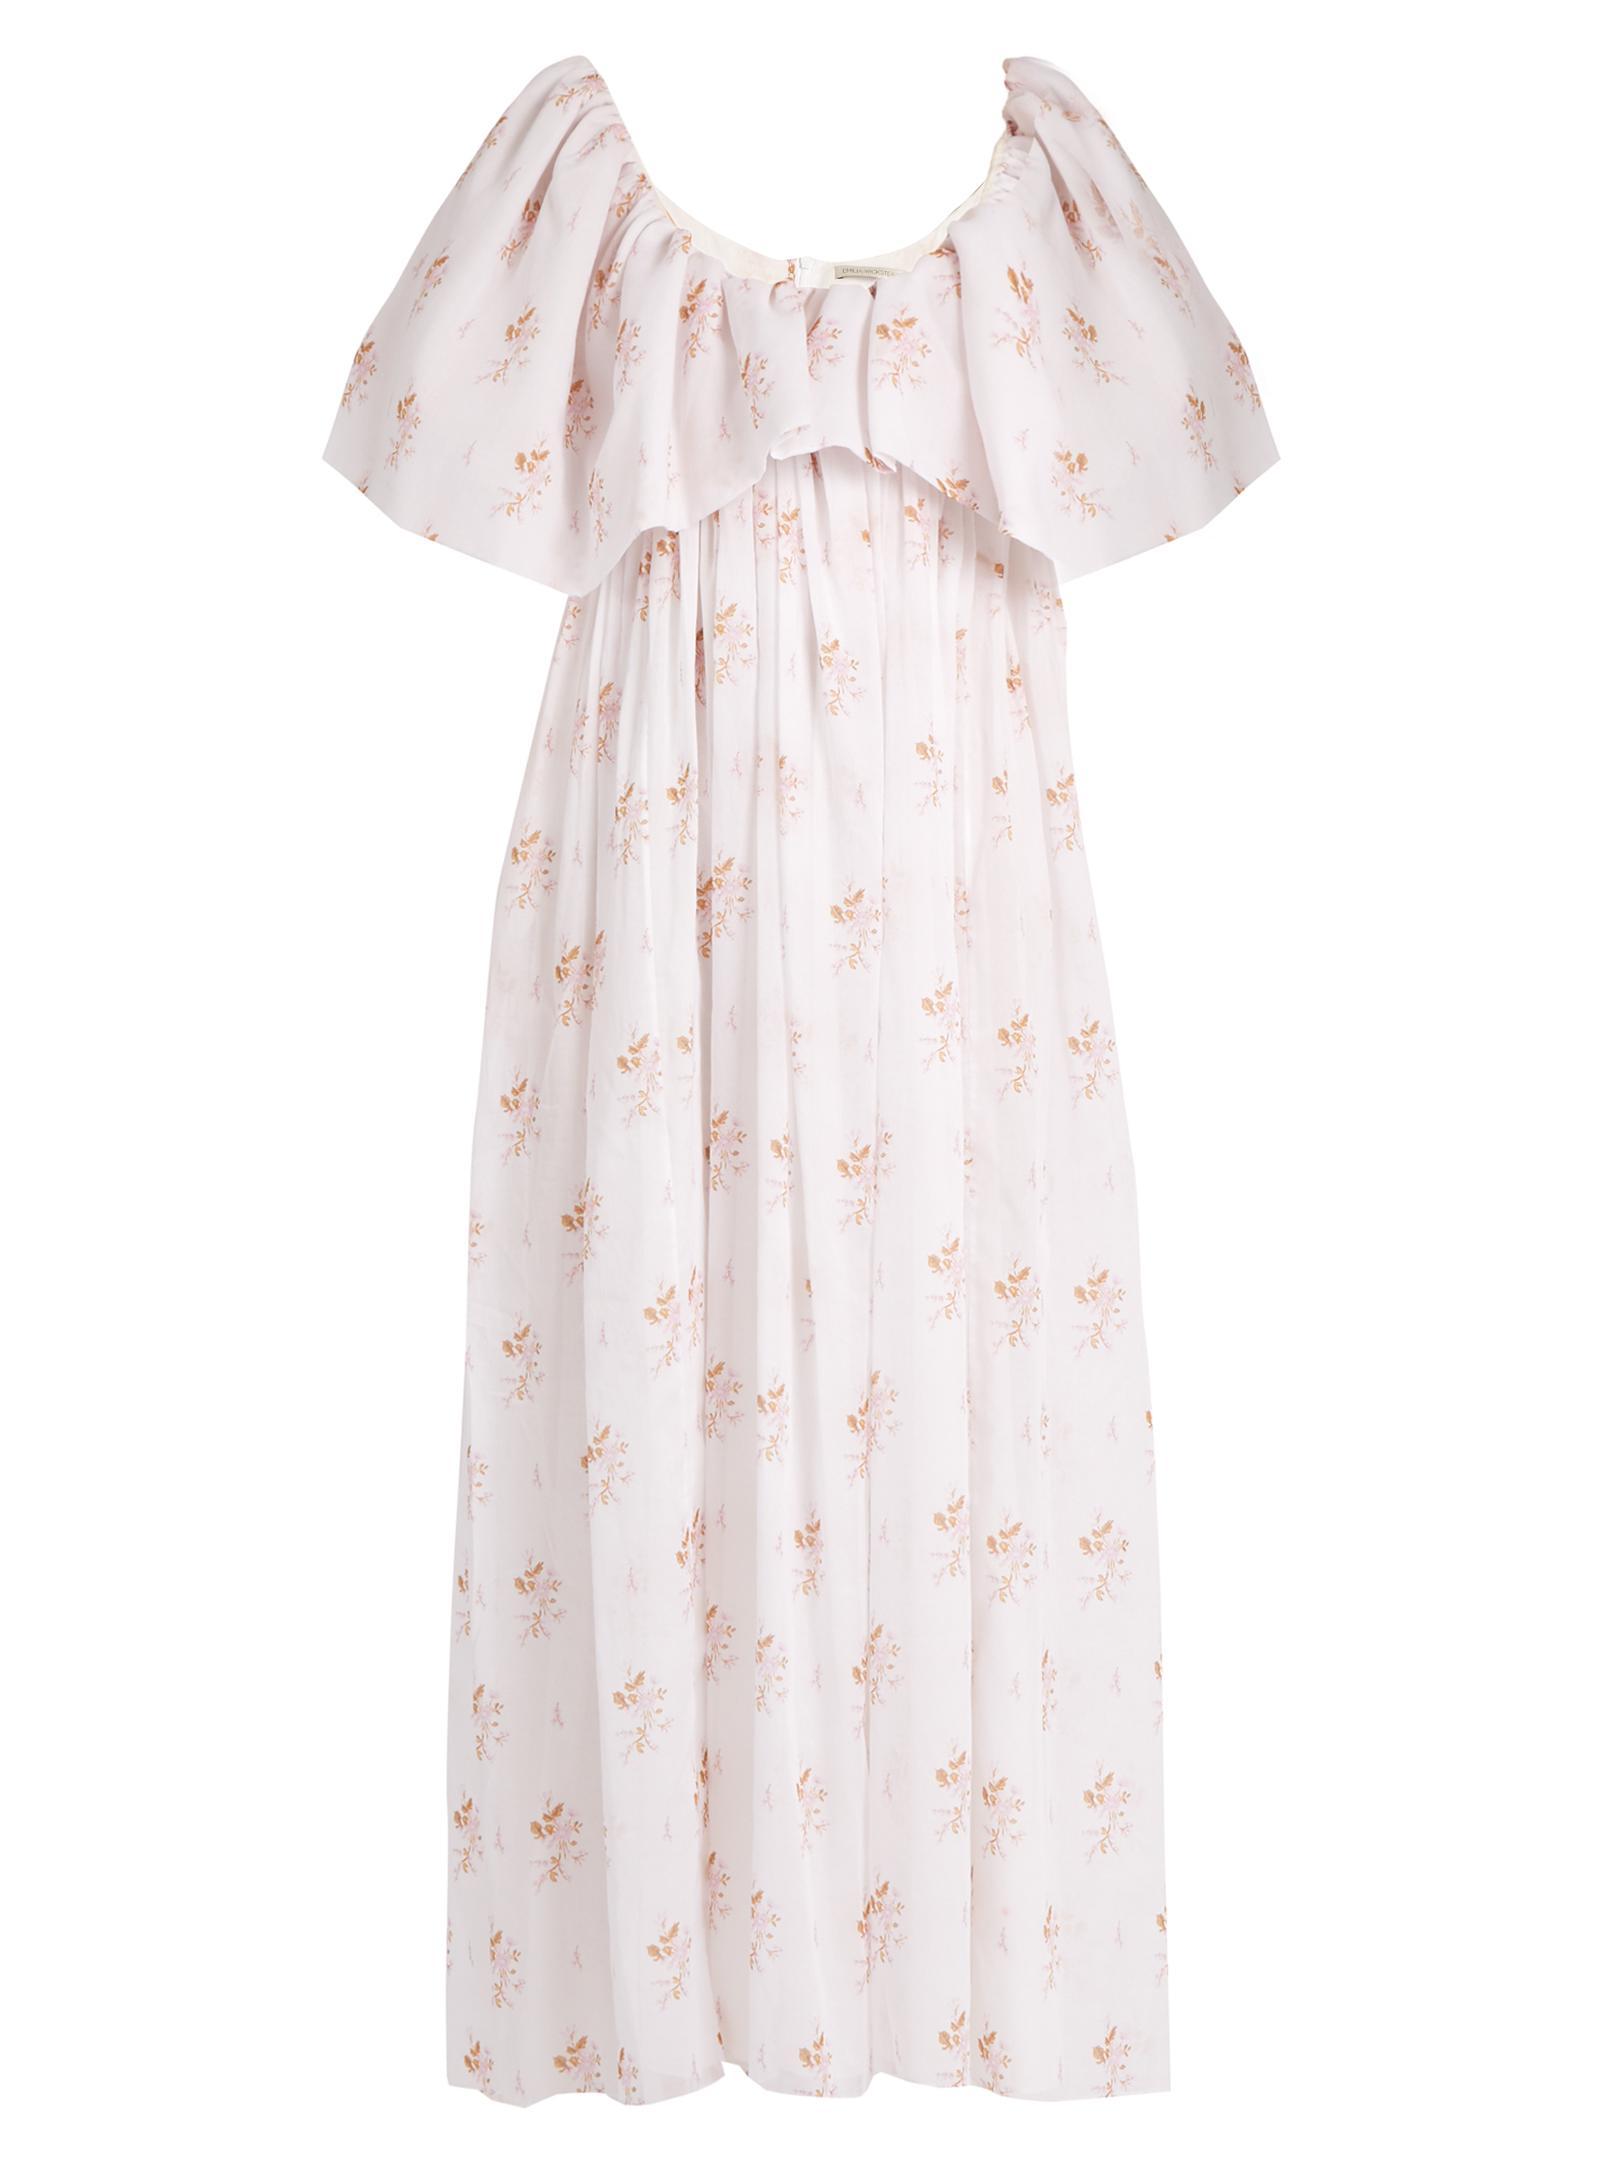 58f8702ad3d Lyst - Emilia Wickstead Fede Floral-print Empire-waist Cotton Dress ...